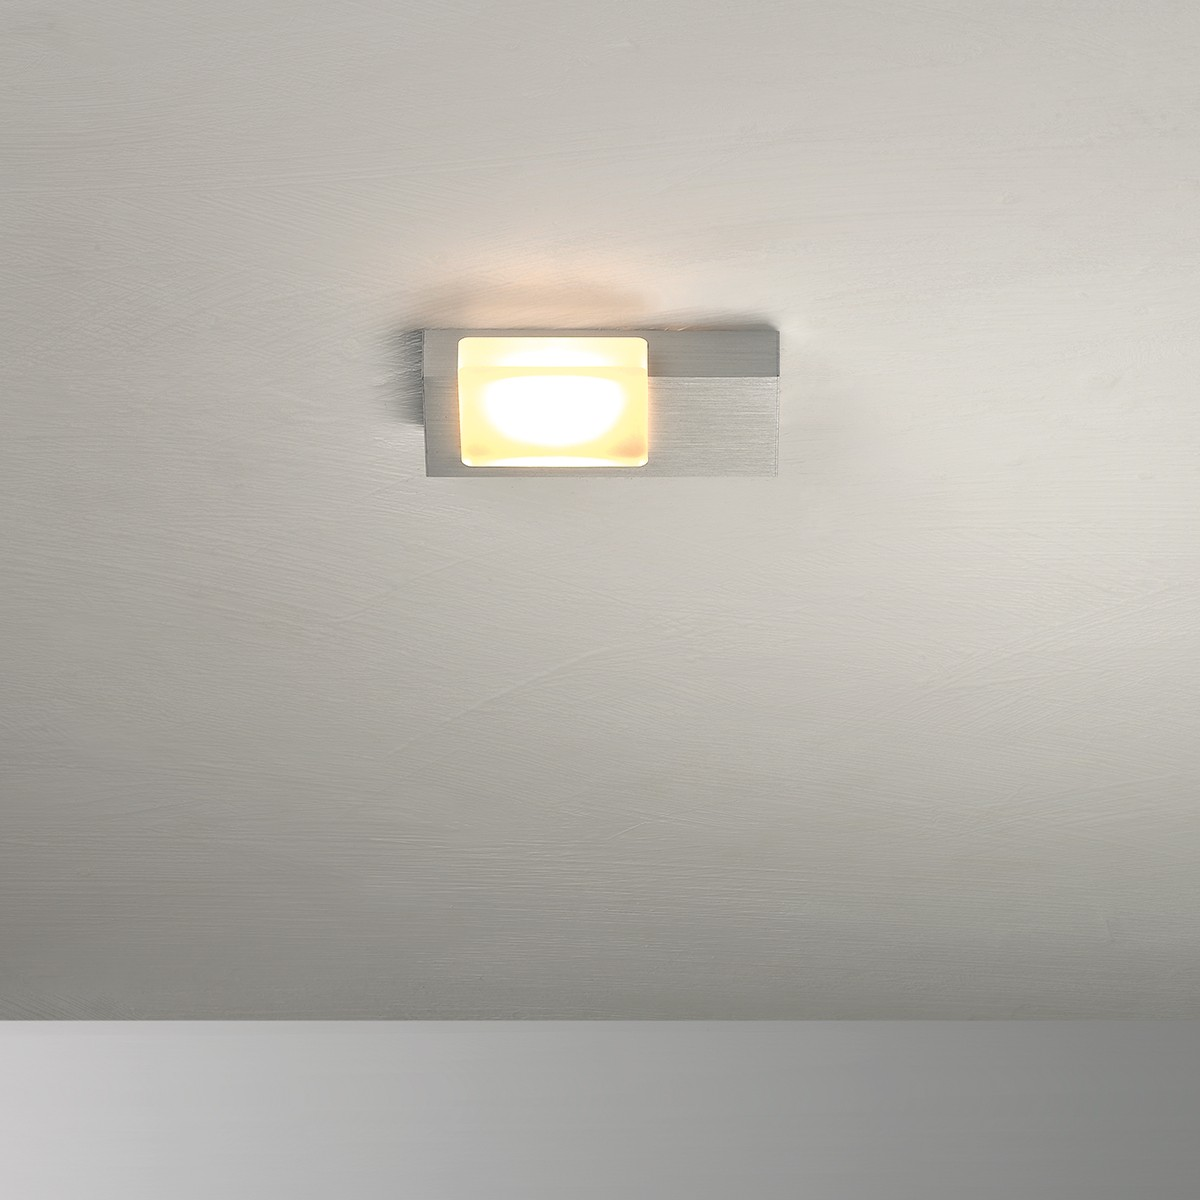 Bopp Lamina LED Deckenleuchte 1-flg., Aluminium geschliffen